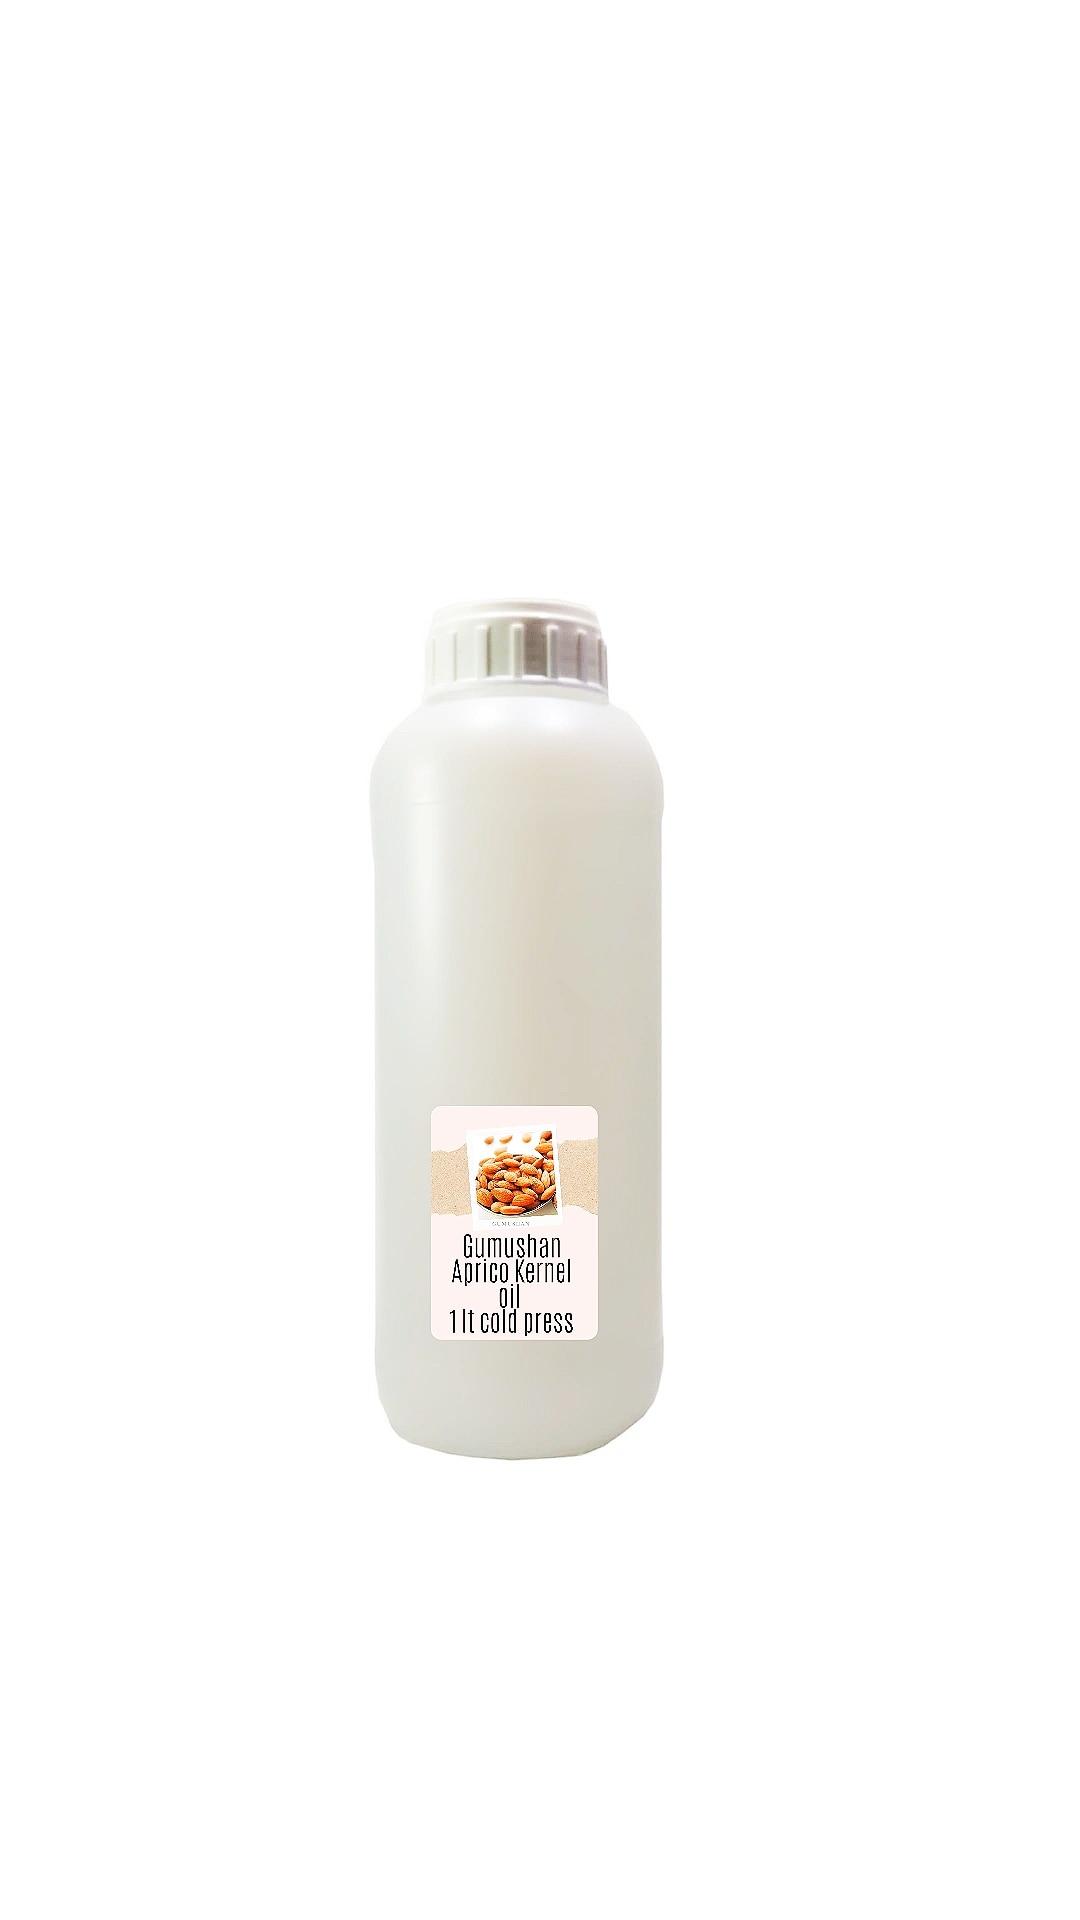 High quality pure Apricot Kernel Oil 1 liter 34 fl oz 1000ml